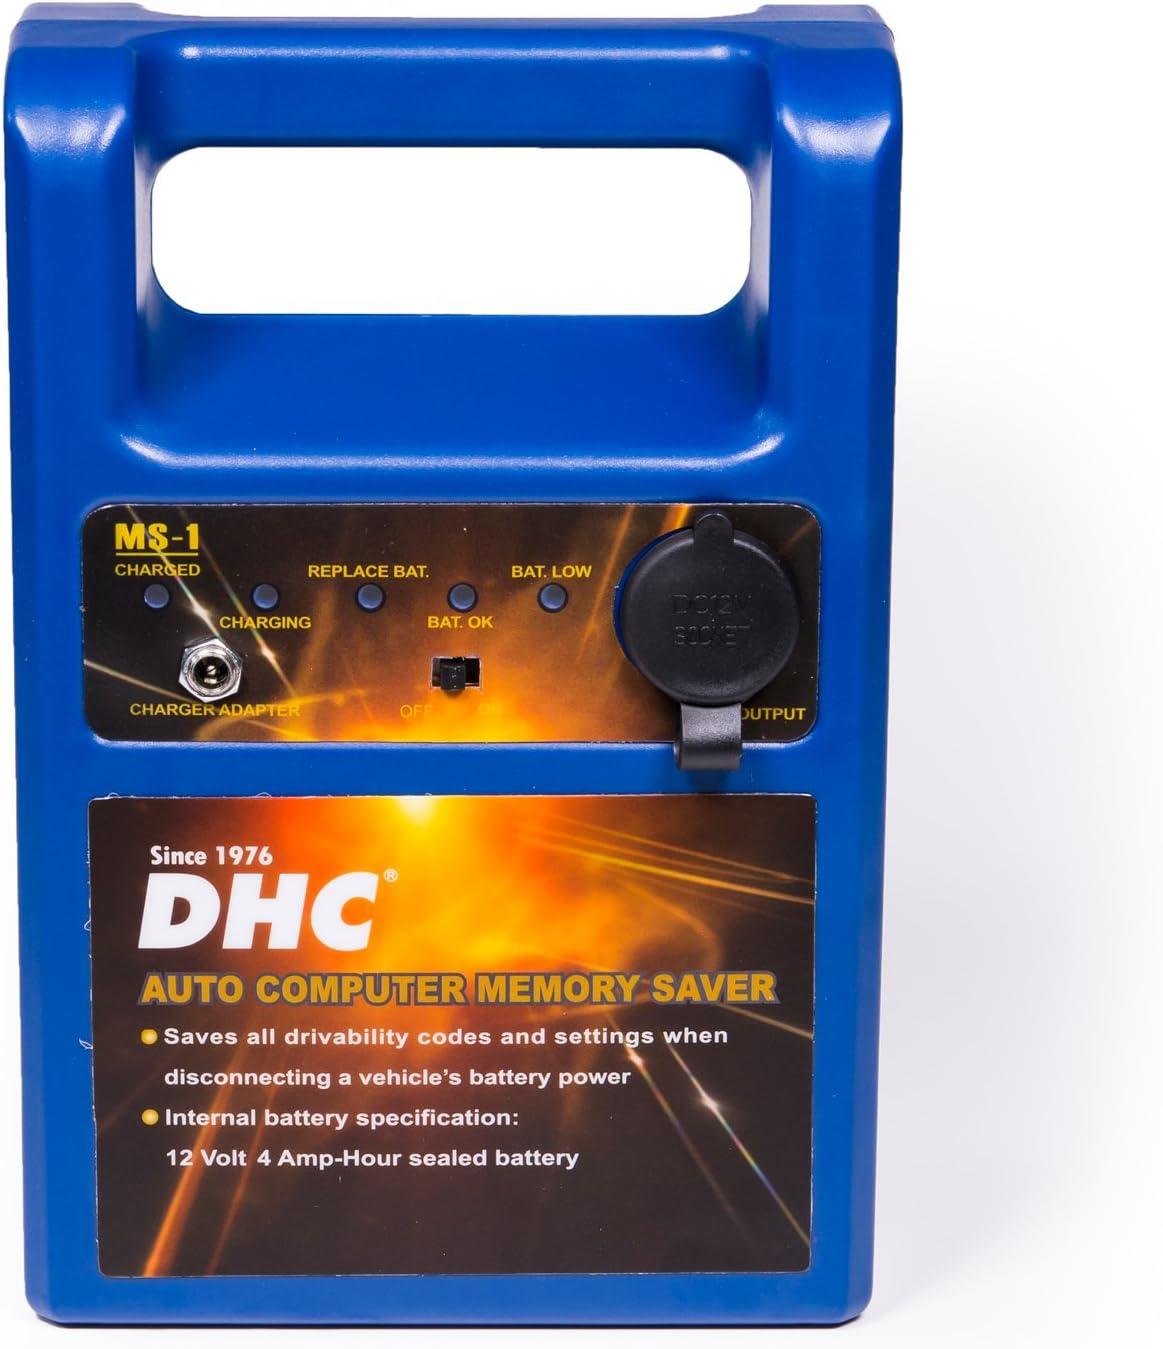 Dhc Memory Saver Ms 1 Obd Ii Datensicherungsgerät Fahrzeug Batterie Auto